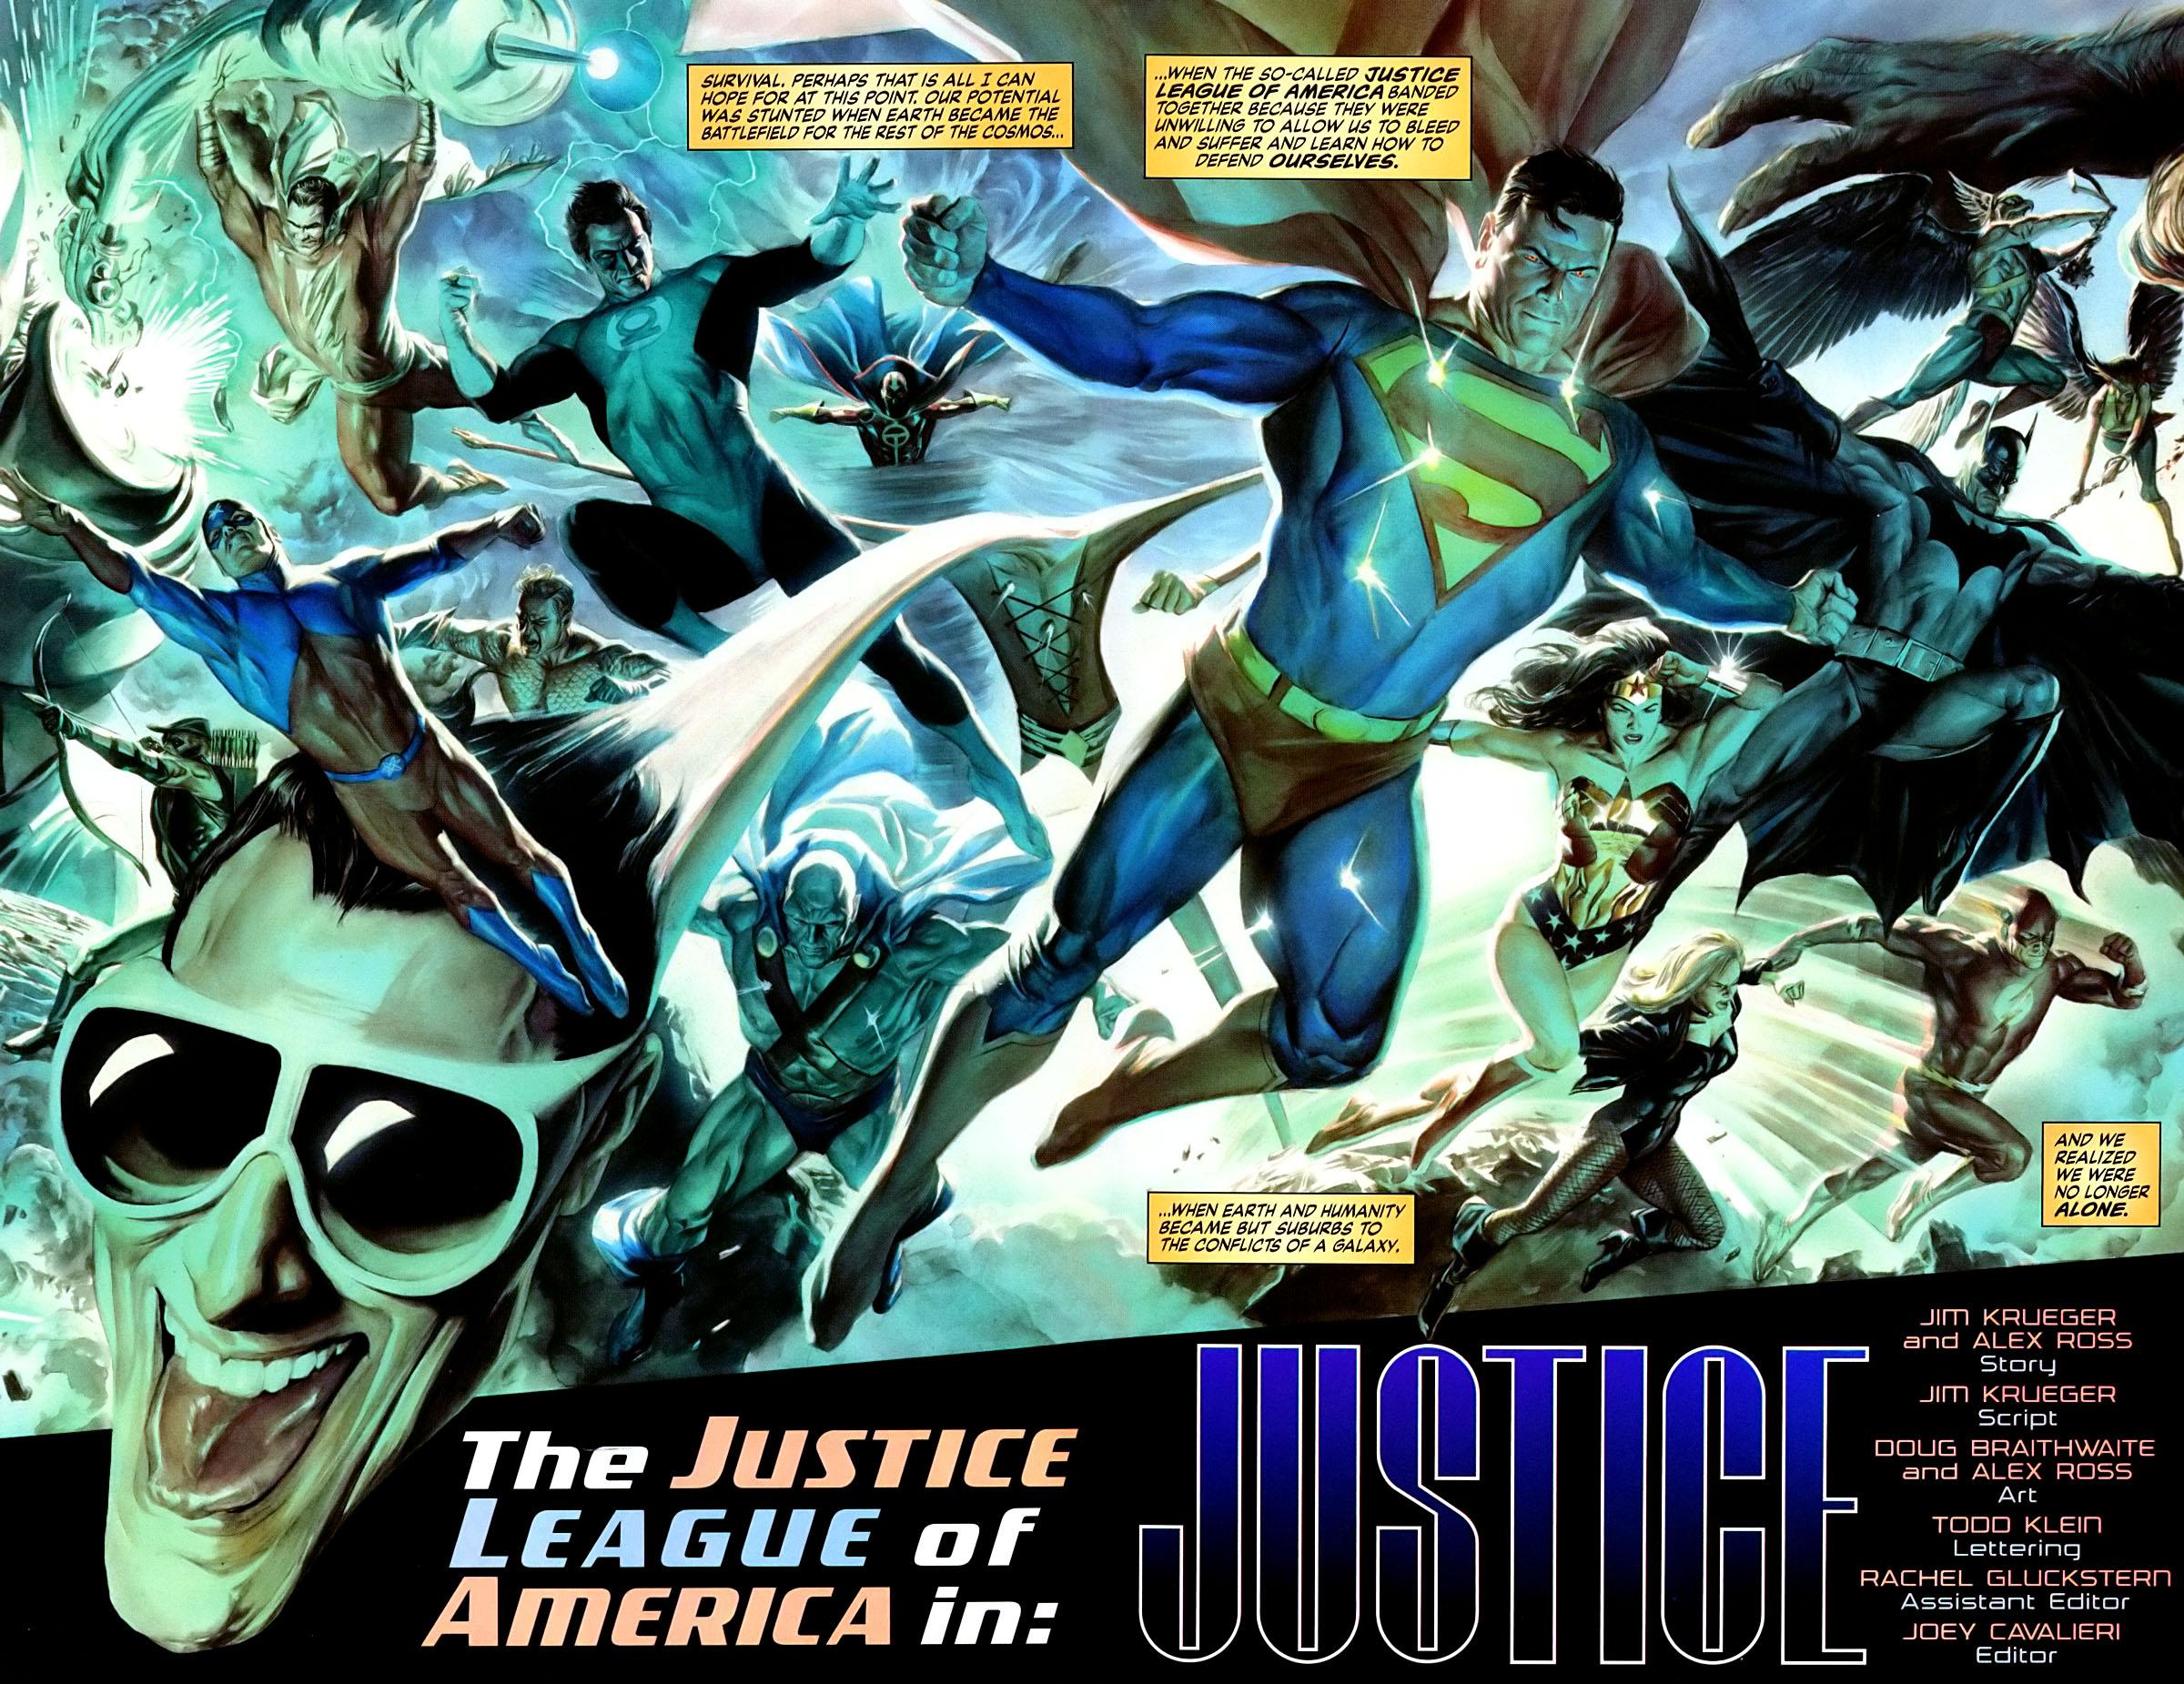 Alpha Coders | Wallpaper Abyss Comics Justice League 340330